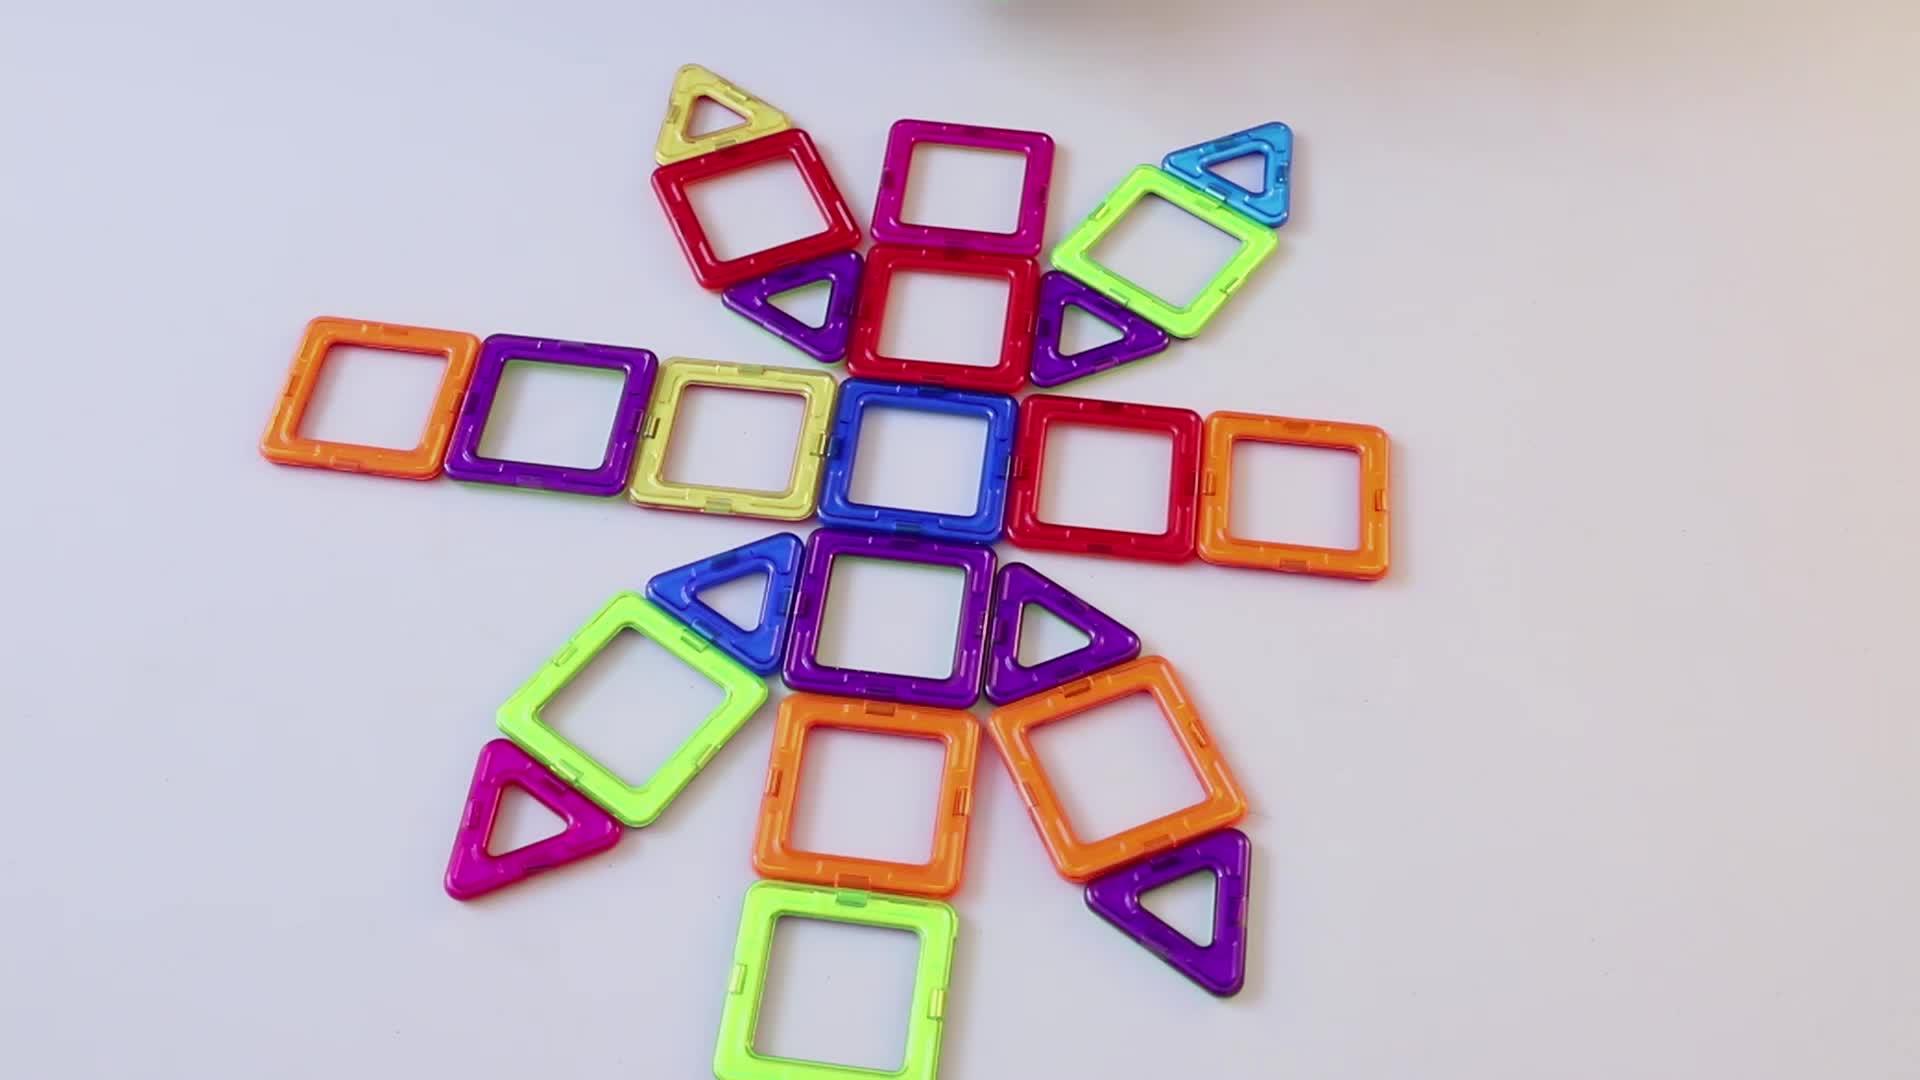 Custom 102pcs classic magnetic building blocks creative construction toy safe ABS plastic building blocks toys for kids